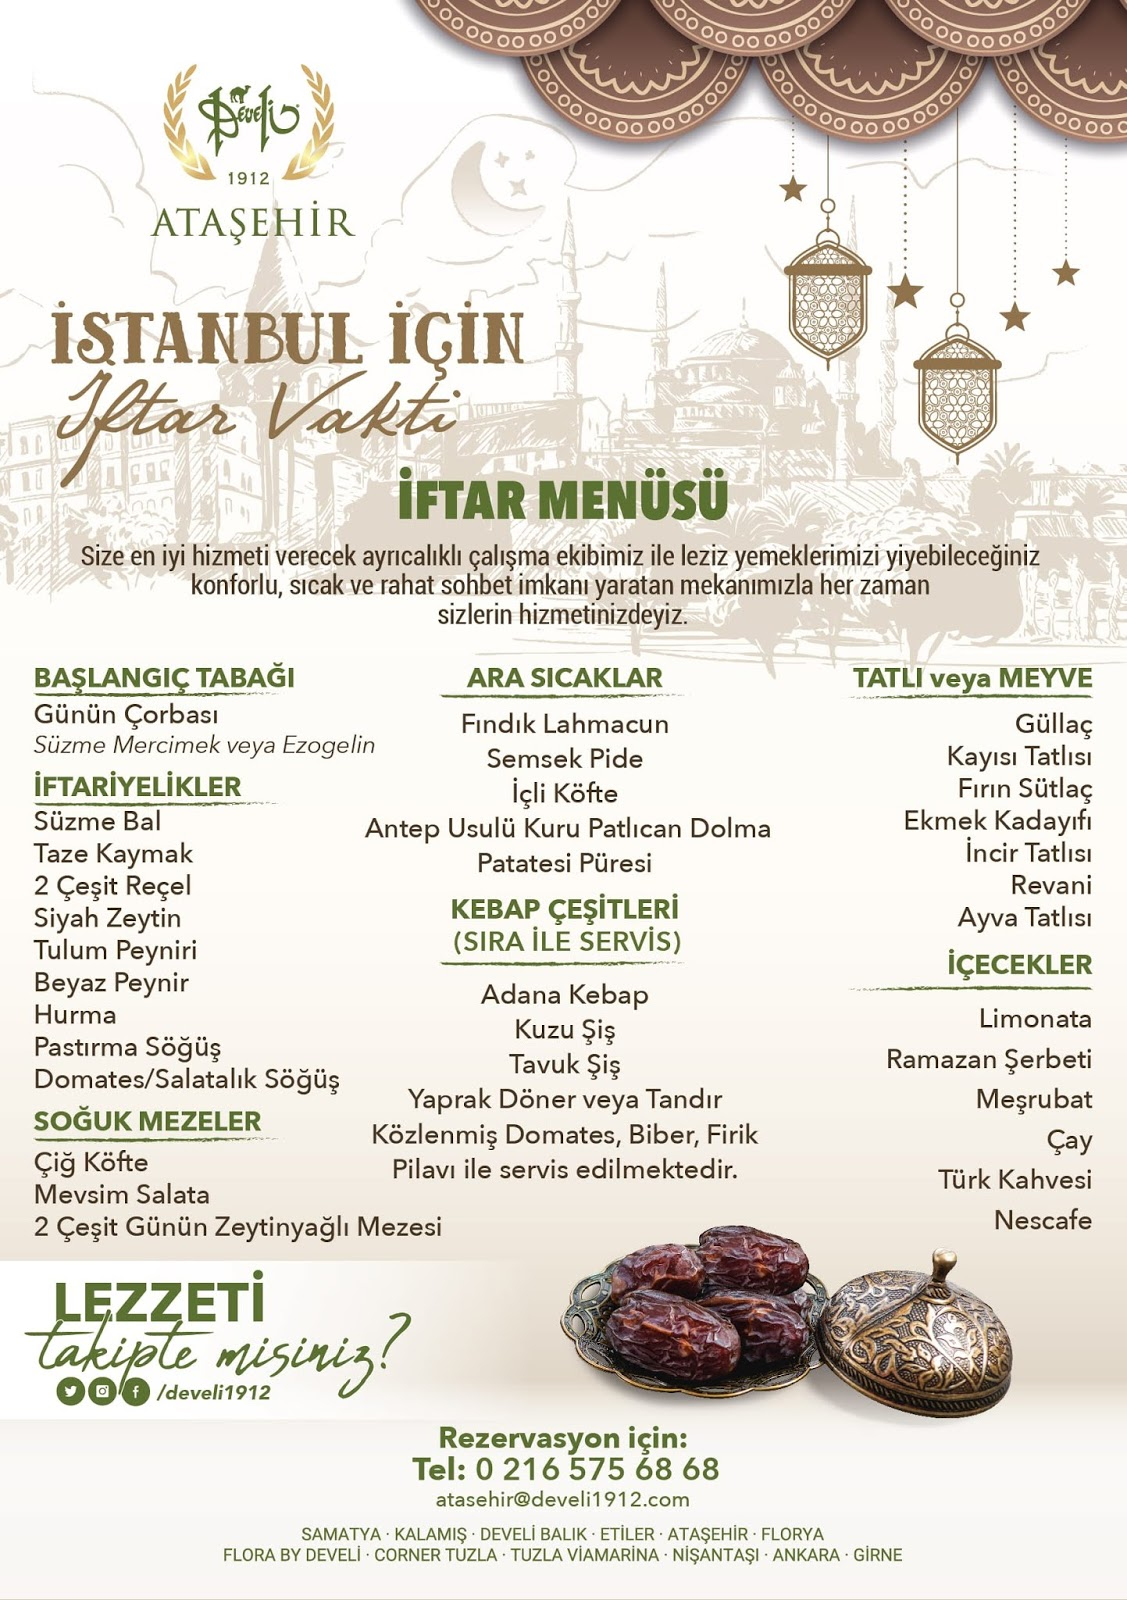 develi iftar menüsü 2019 develi iftar 2019 anadolu yakası iftar mekanları 2019 en iyi iftar mekanları istanbul